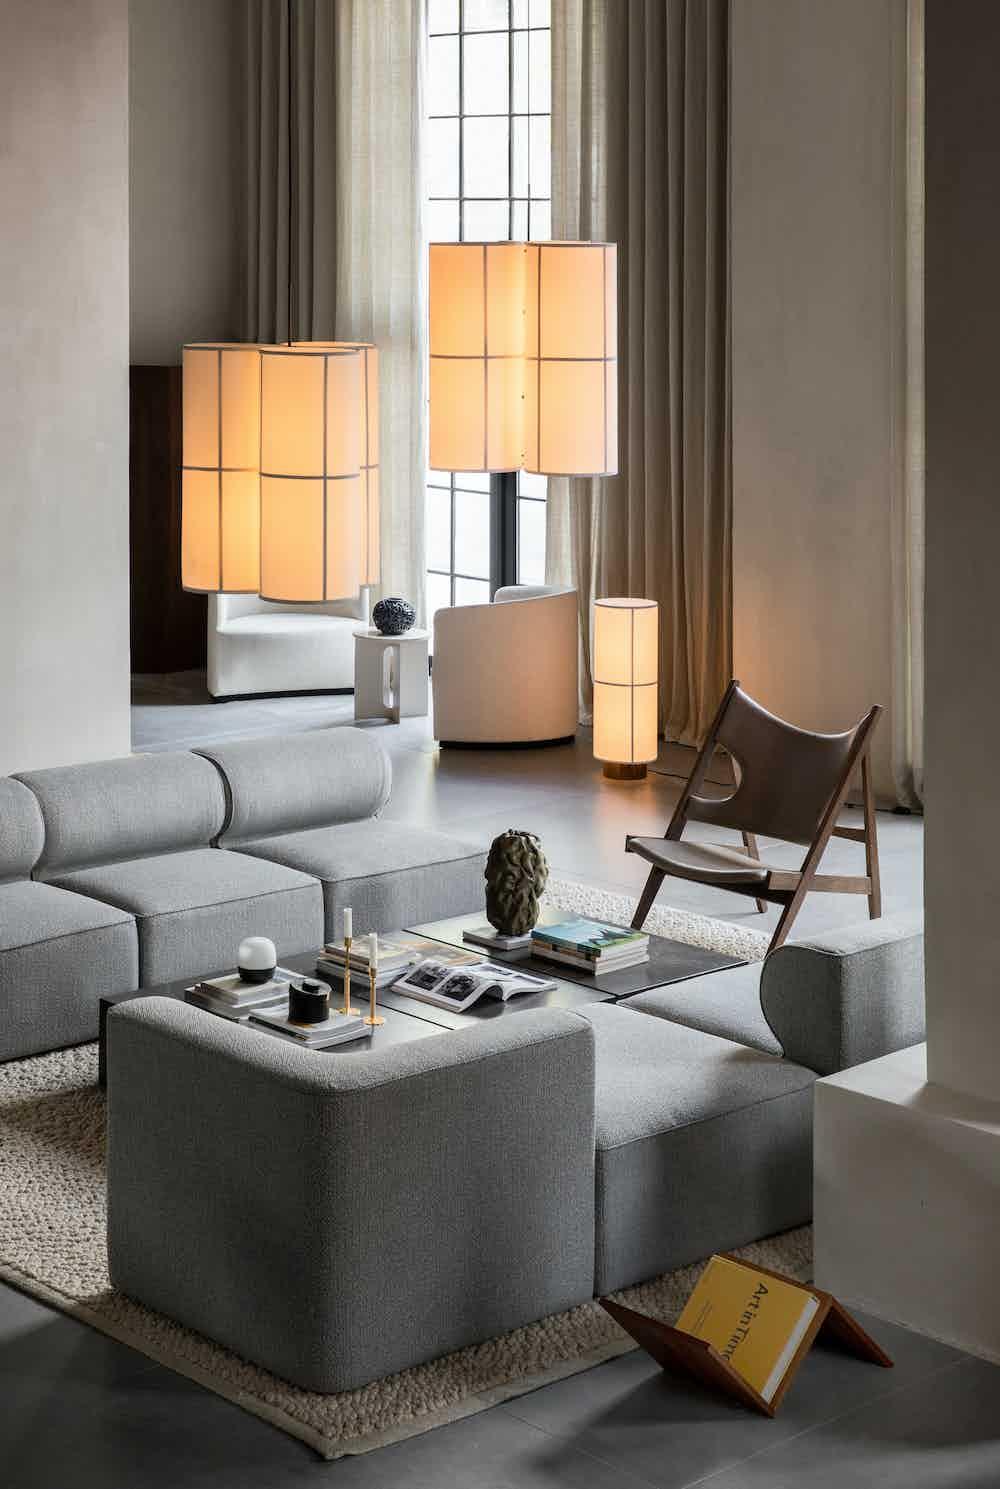 Menu furniture harisha pendant cluster insitu trio haute living copy